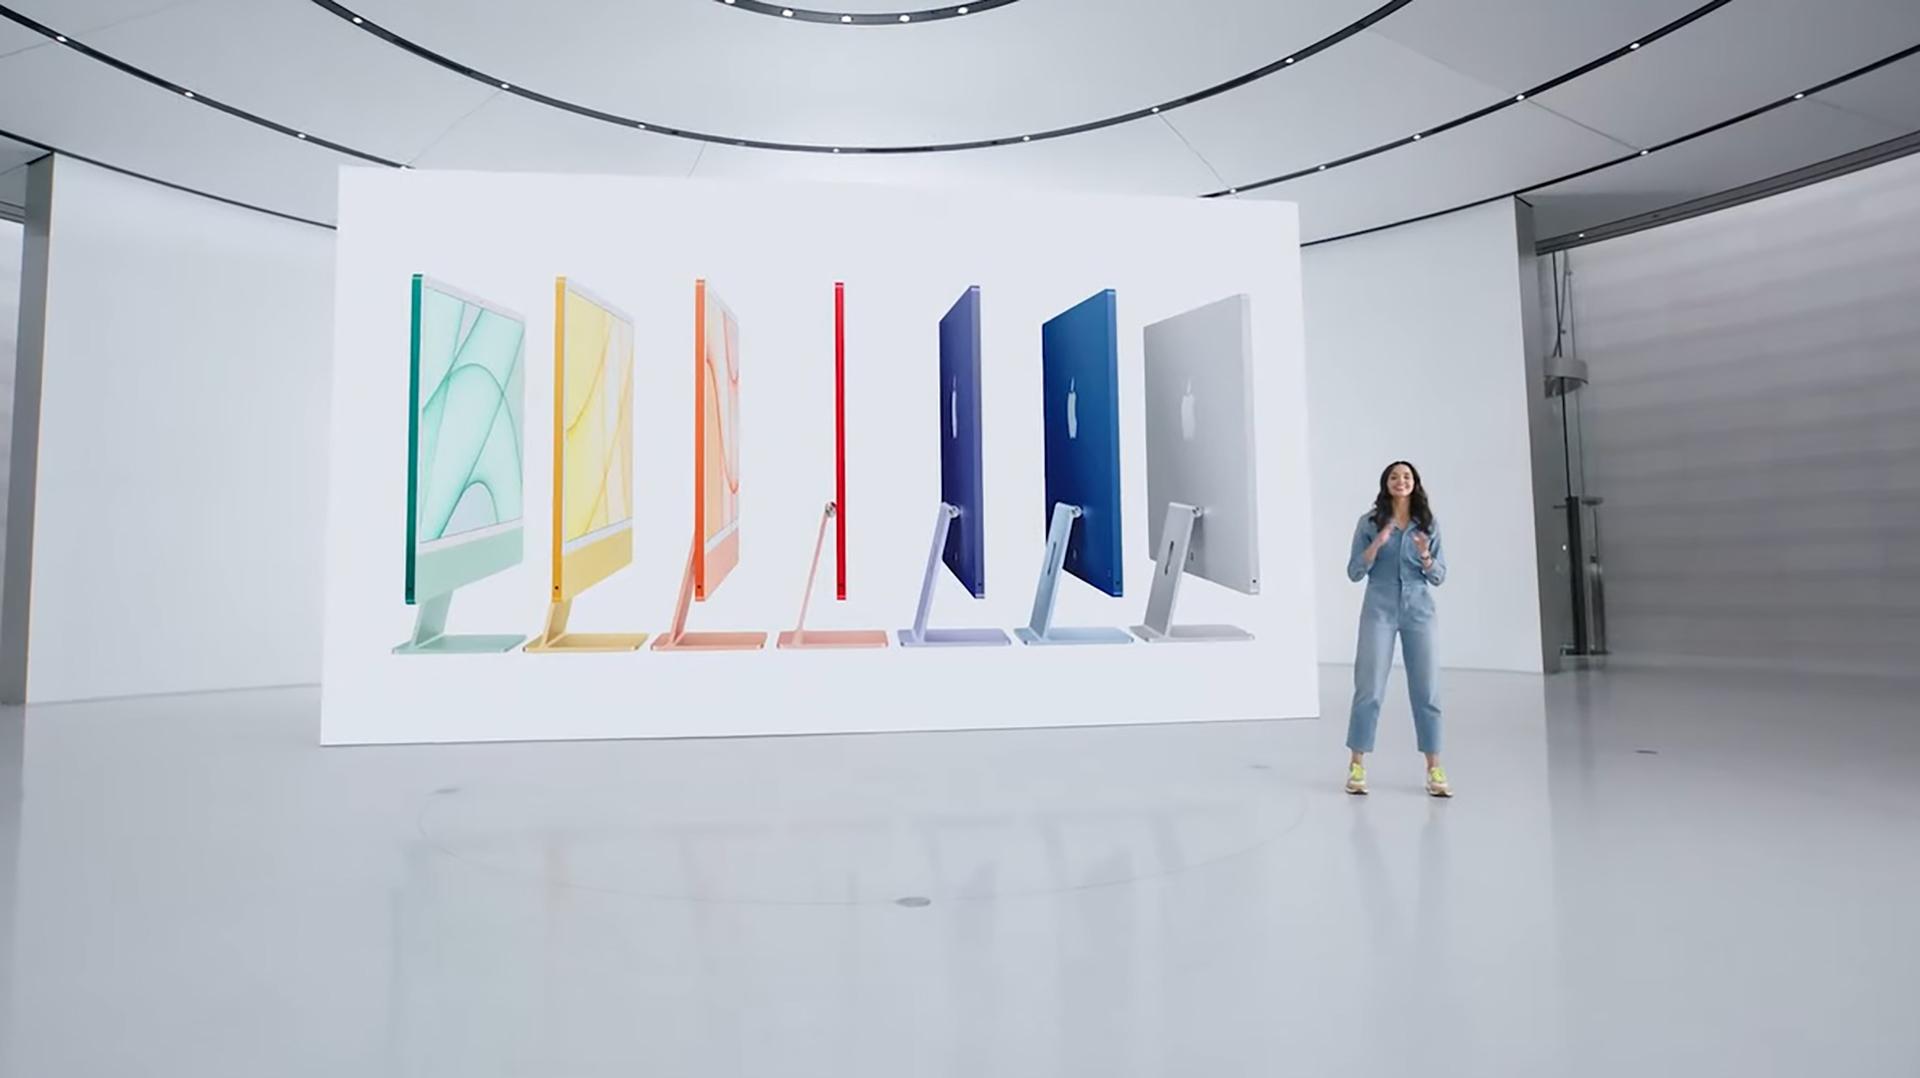 Apple April 2021 event iMac